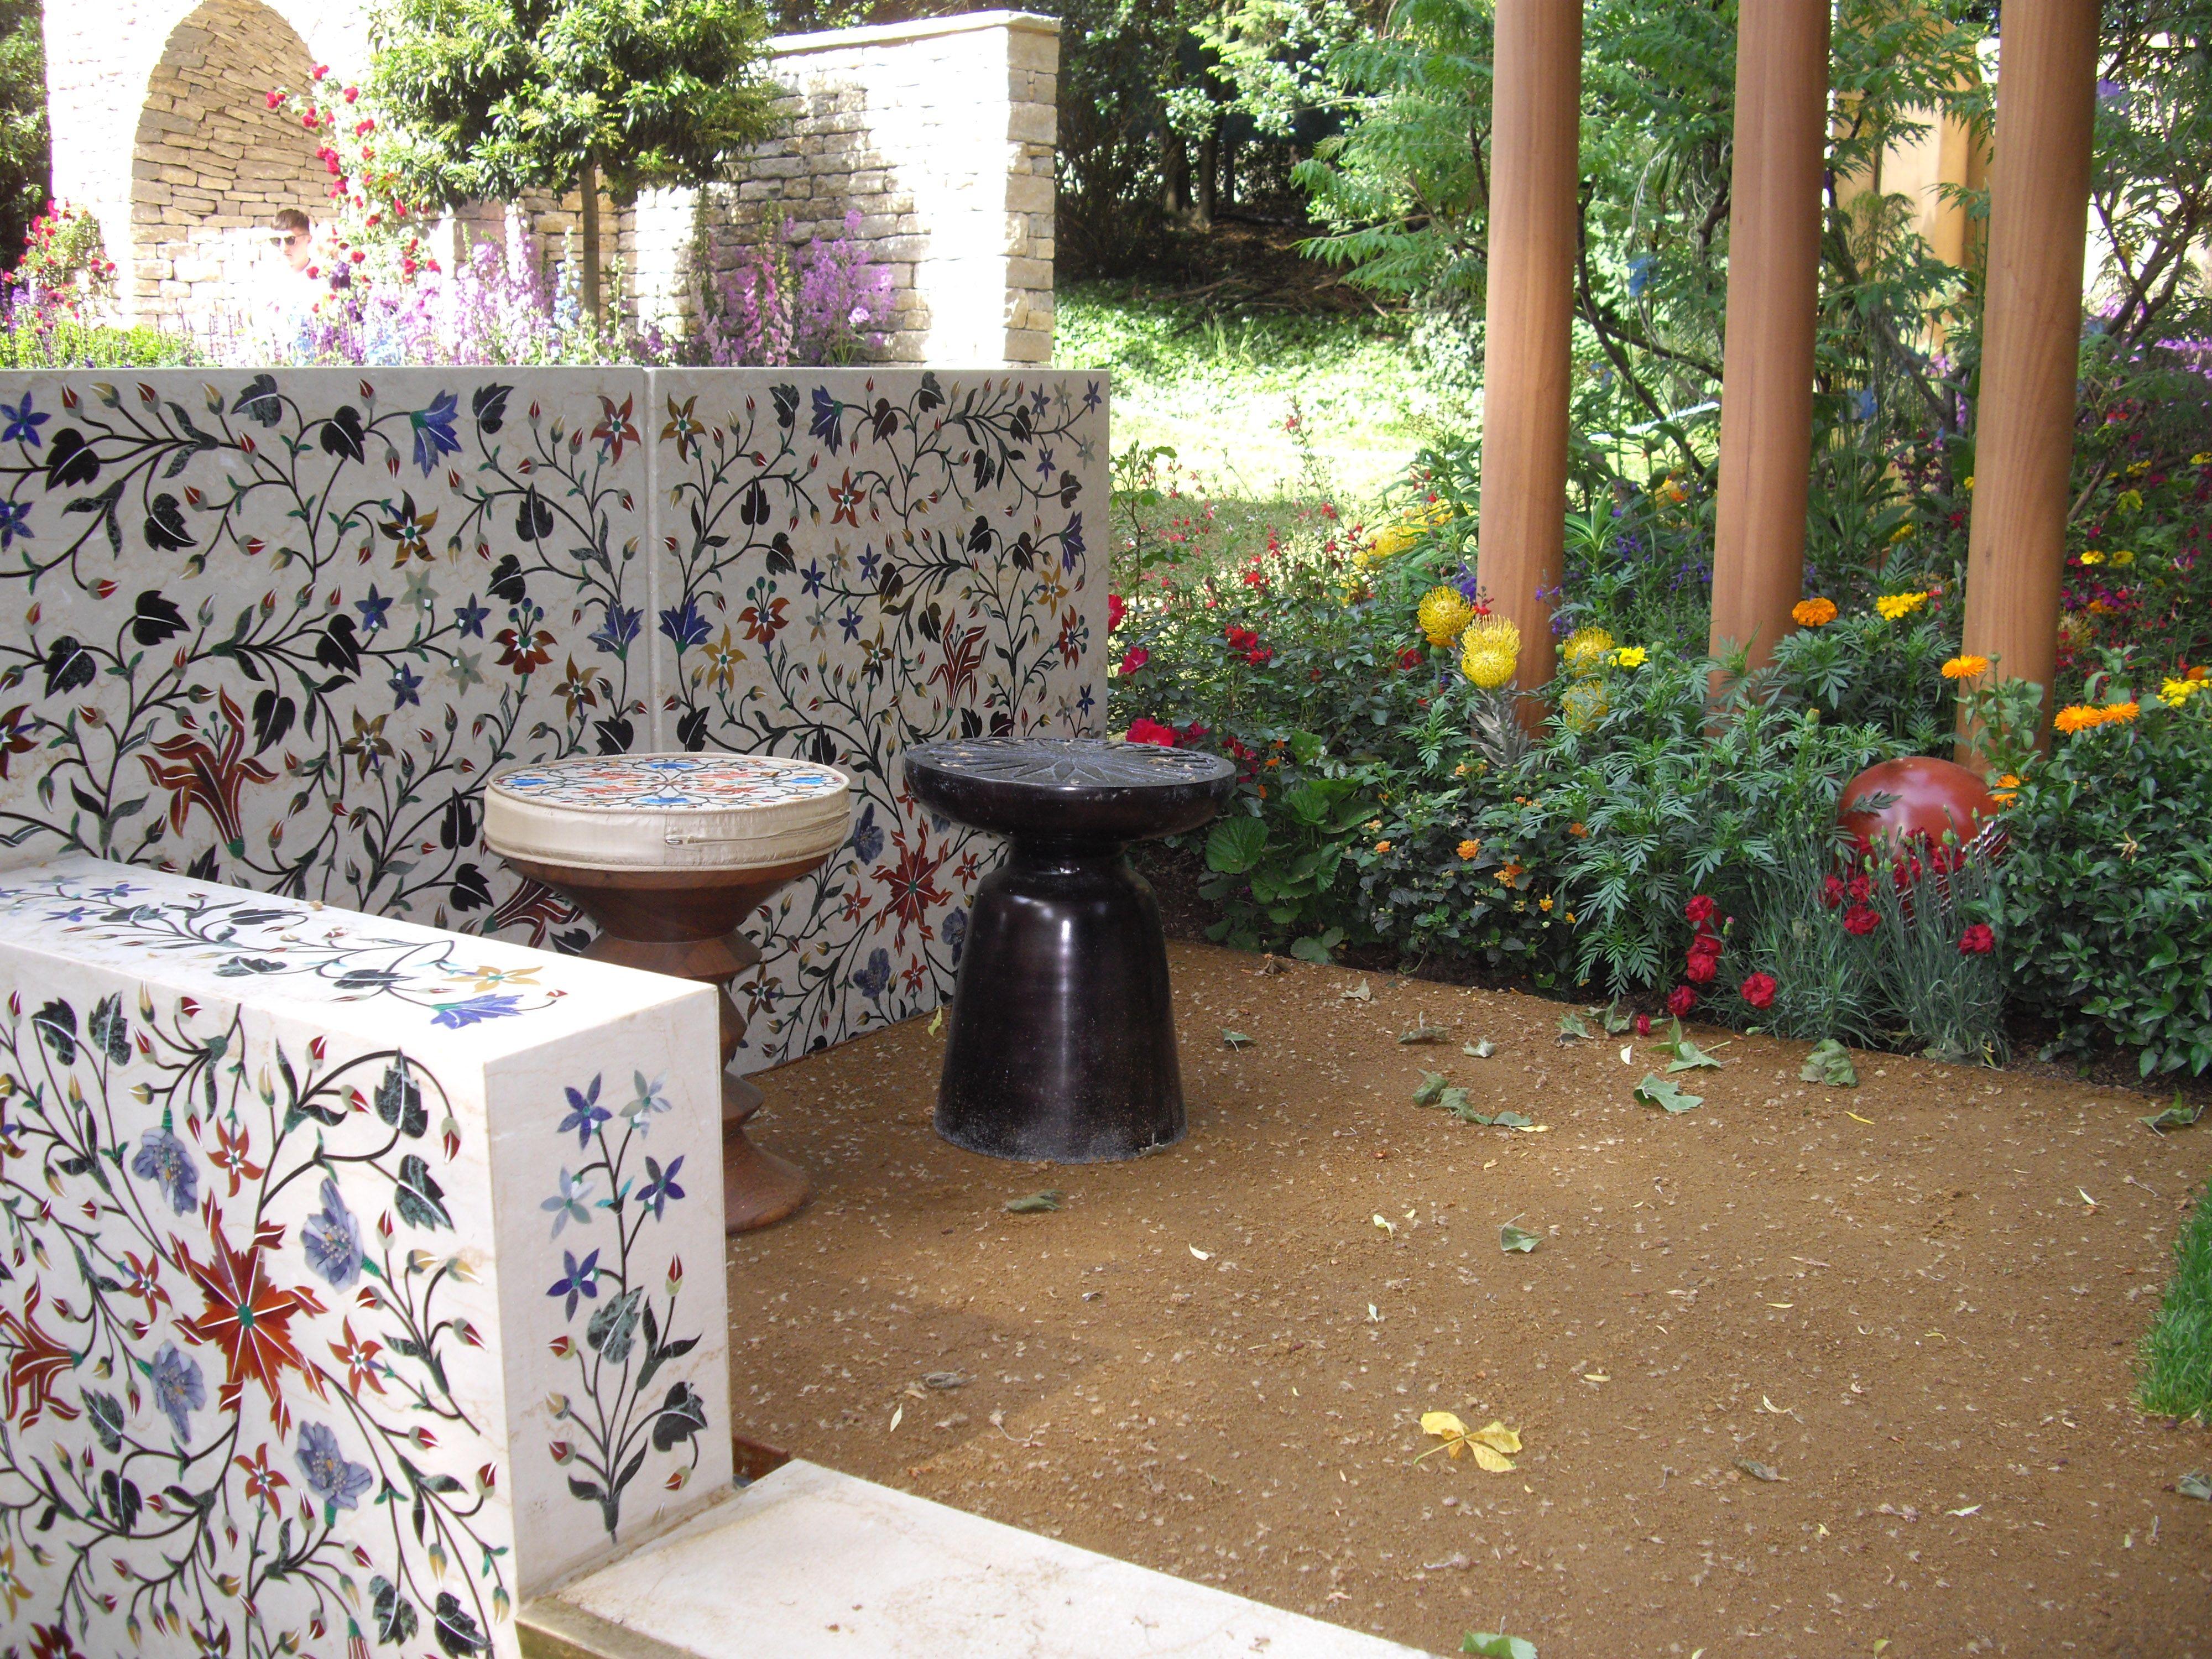 indian artisan garden at the chelsea flower show 2018   the social